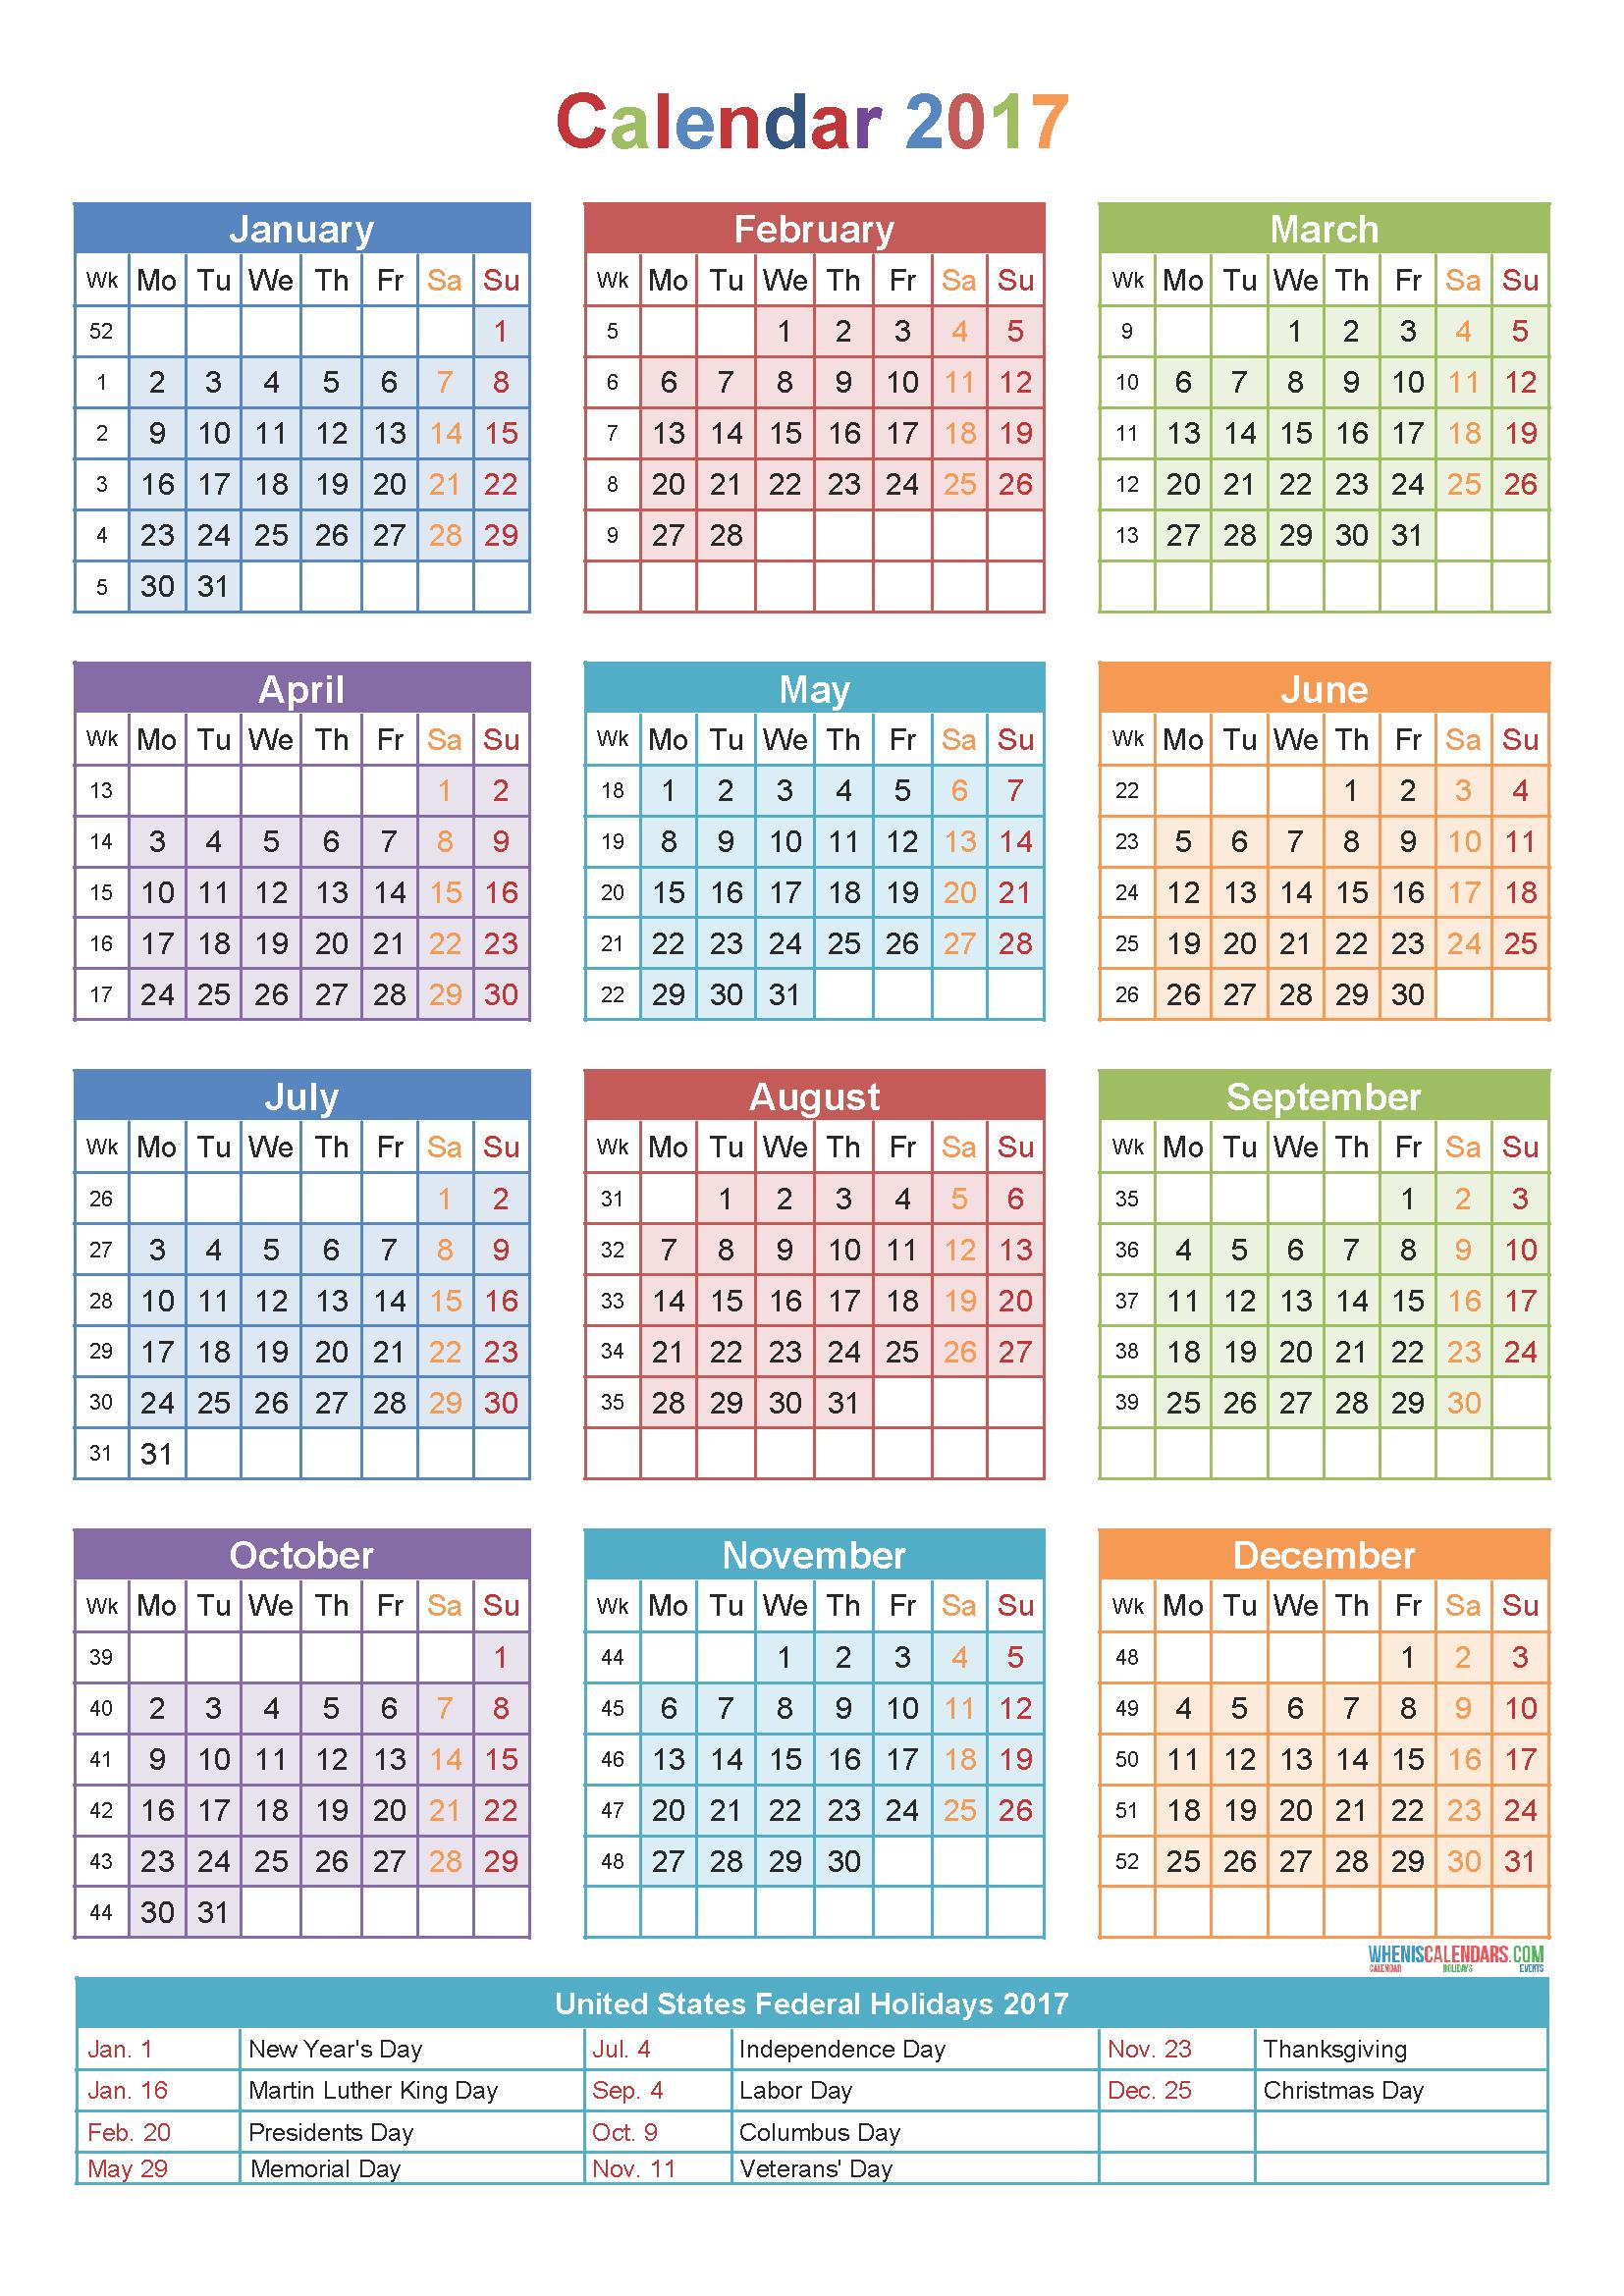 Calendar 2017Week Number | Holidays | Yearly Calendar Template Calendar Week 43 2019